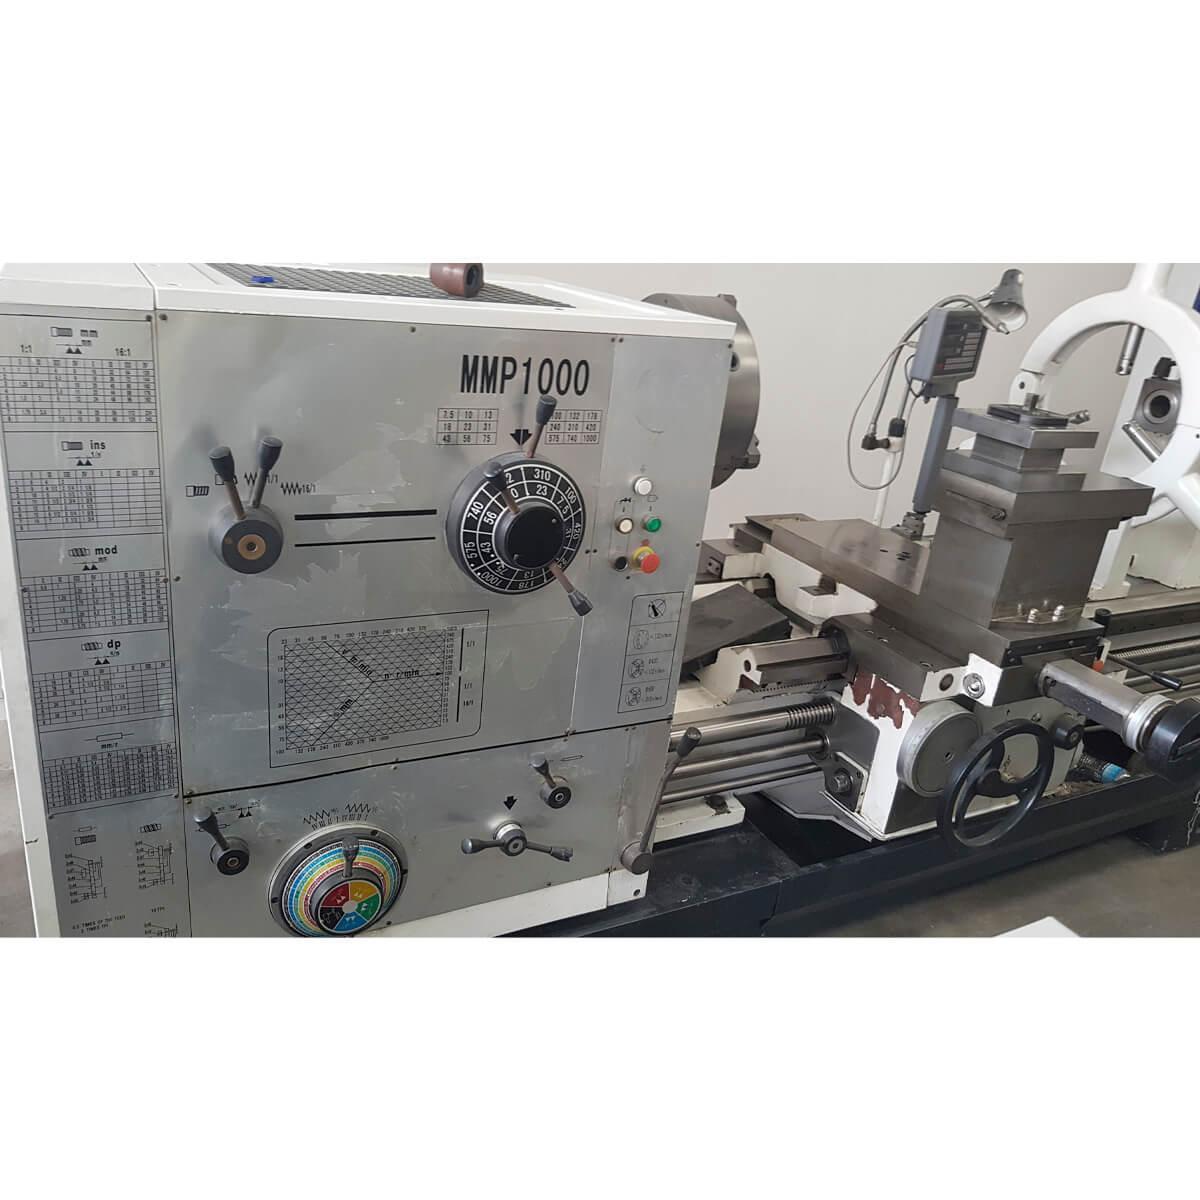 Torno Mecanico Mod. Mmp 1000 X 1500 Tornitec